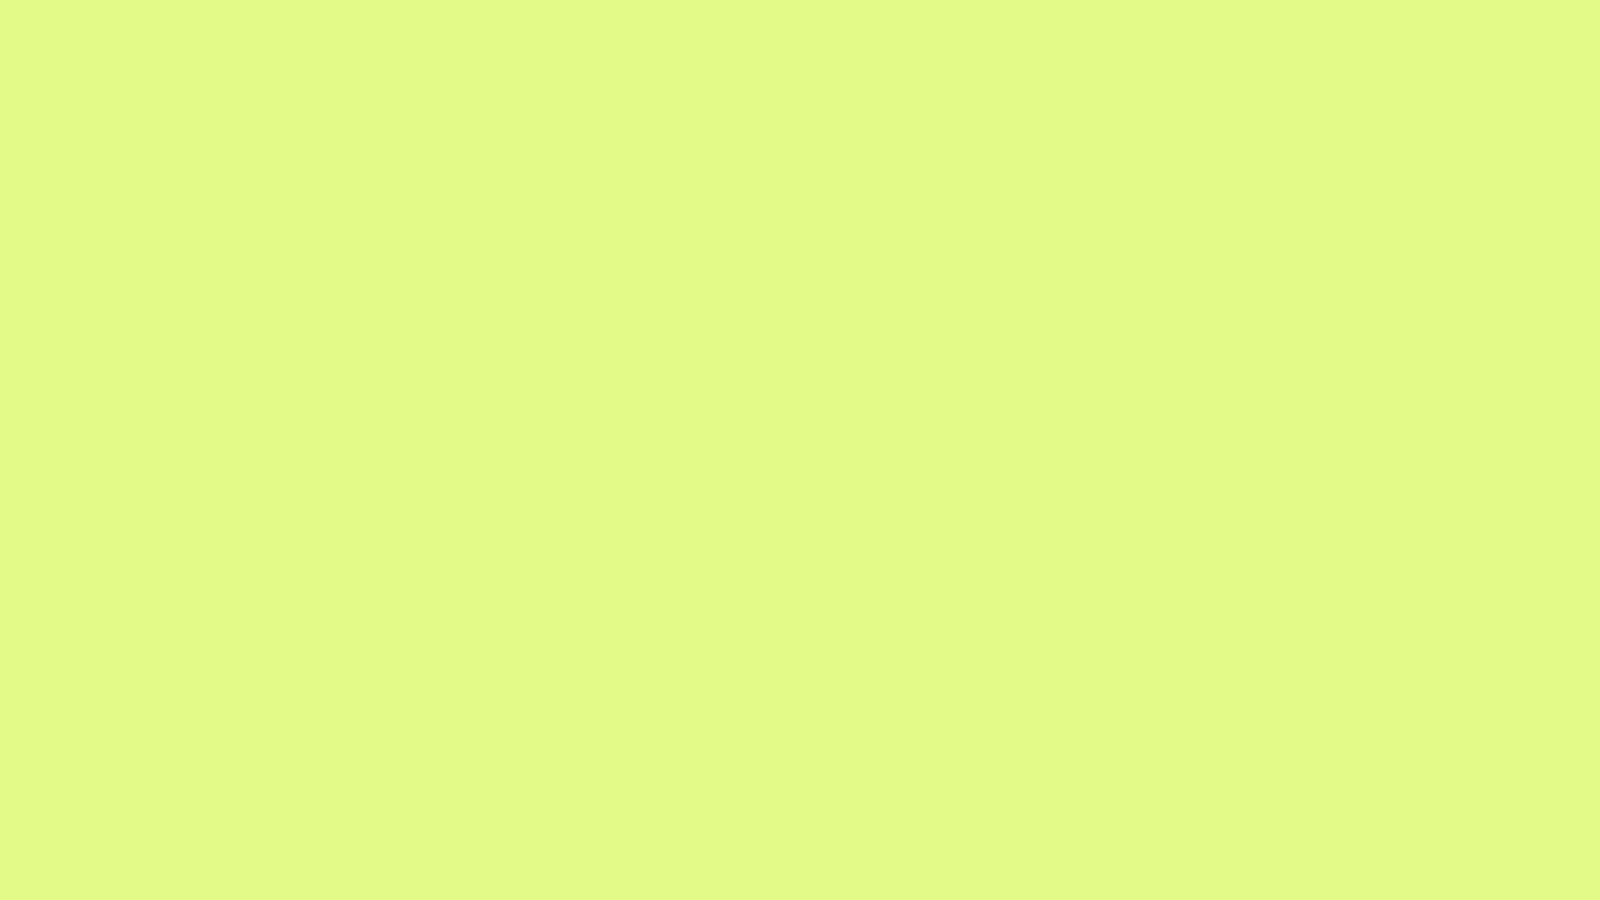 1600x900 Midori Solid Color Background